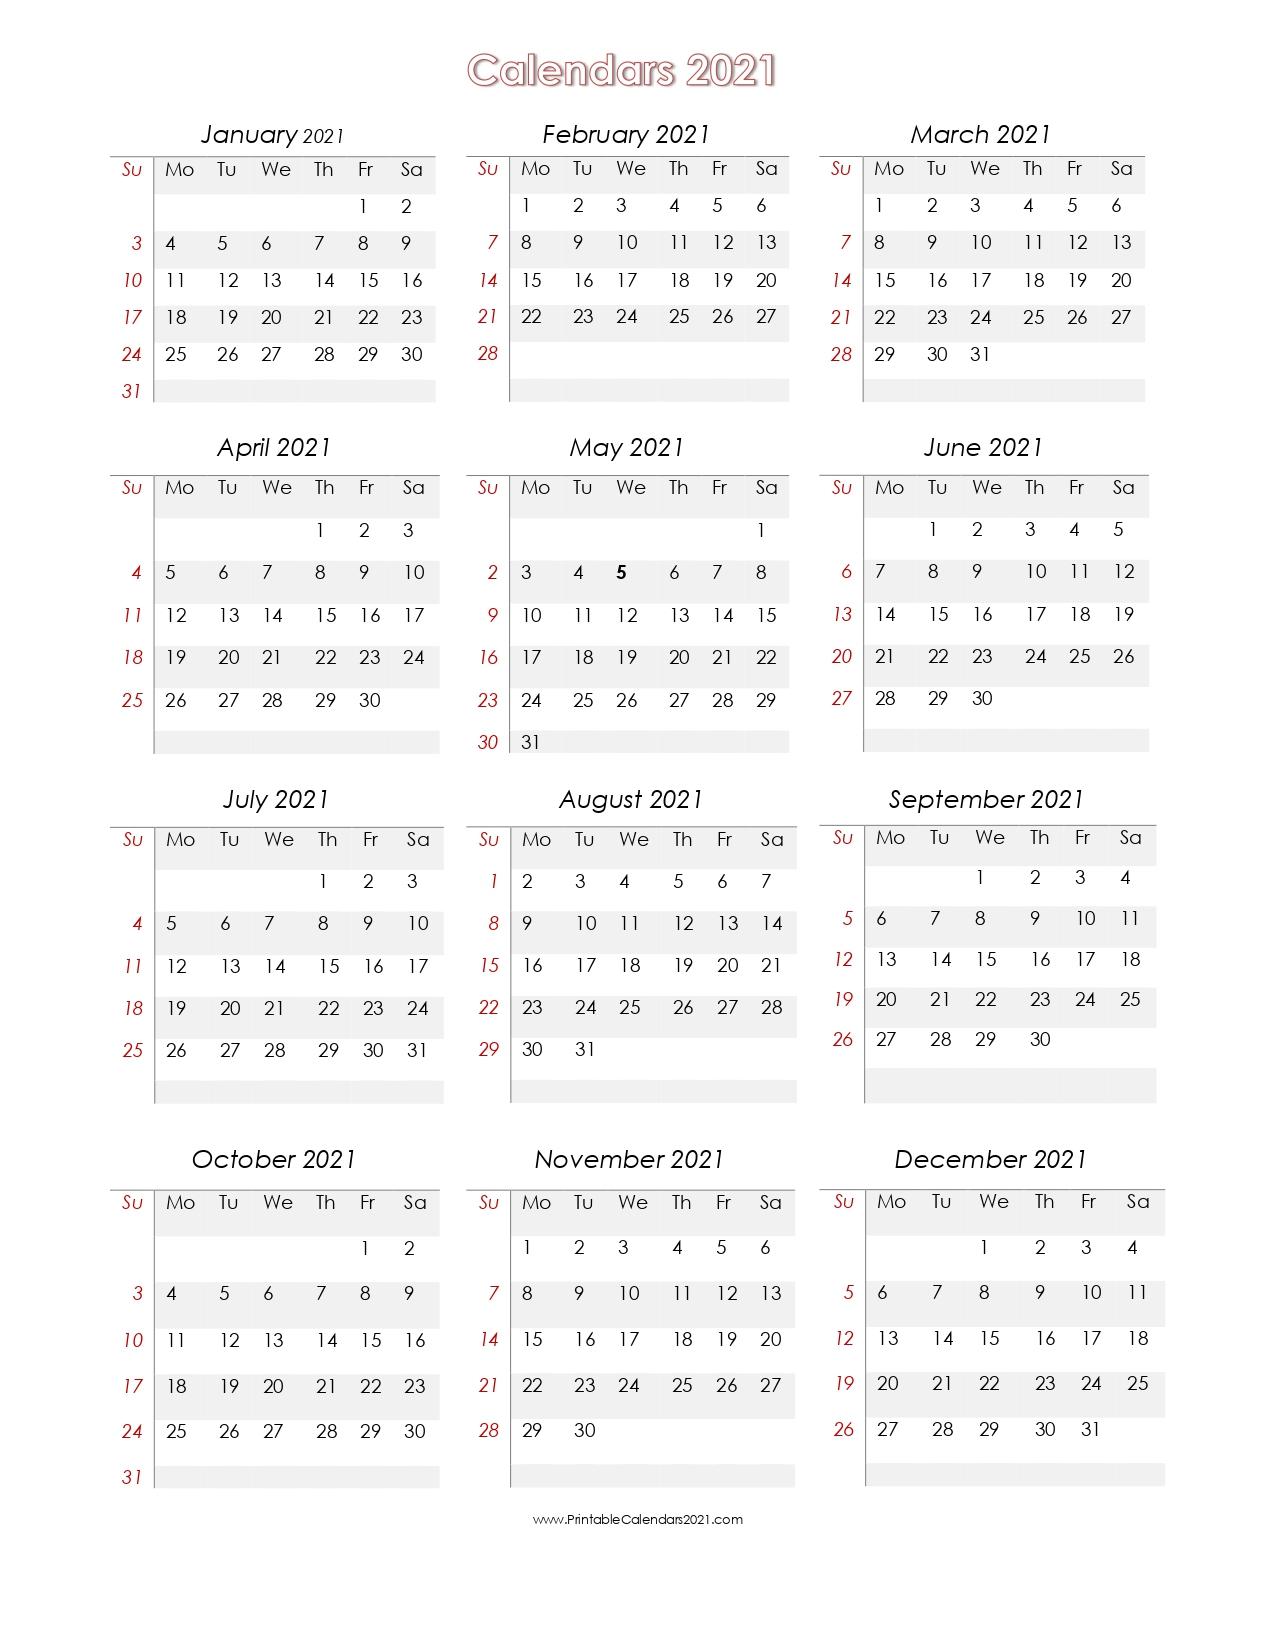 56+ Printable Calendar 2021 One Page, Us 2021 Calendar throughout Printable Pocket Size Calendar 2021